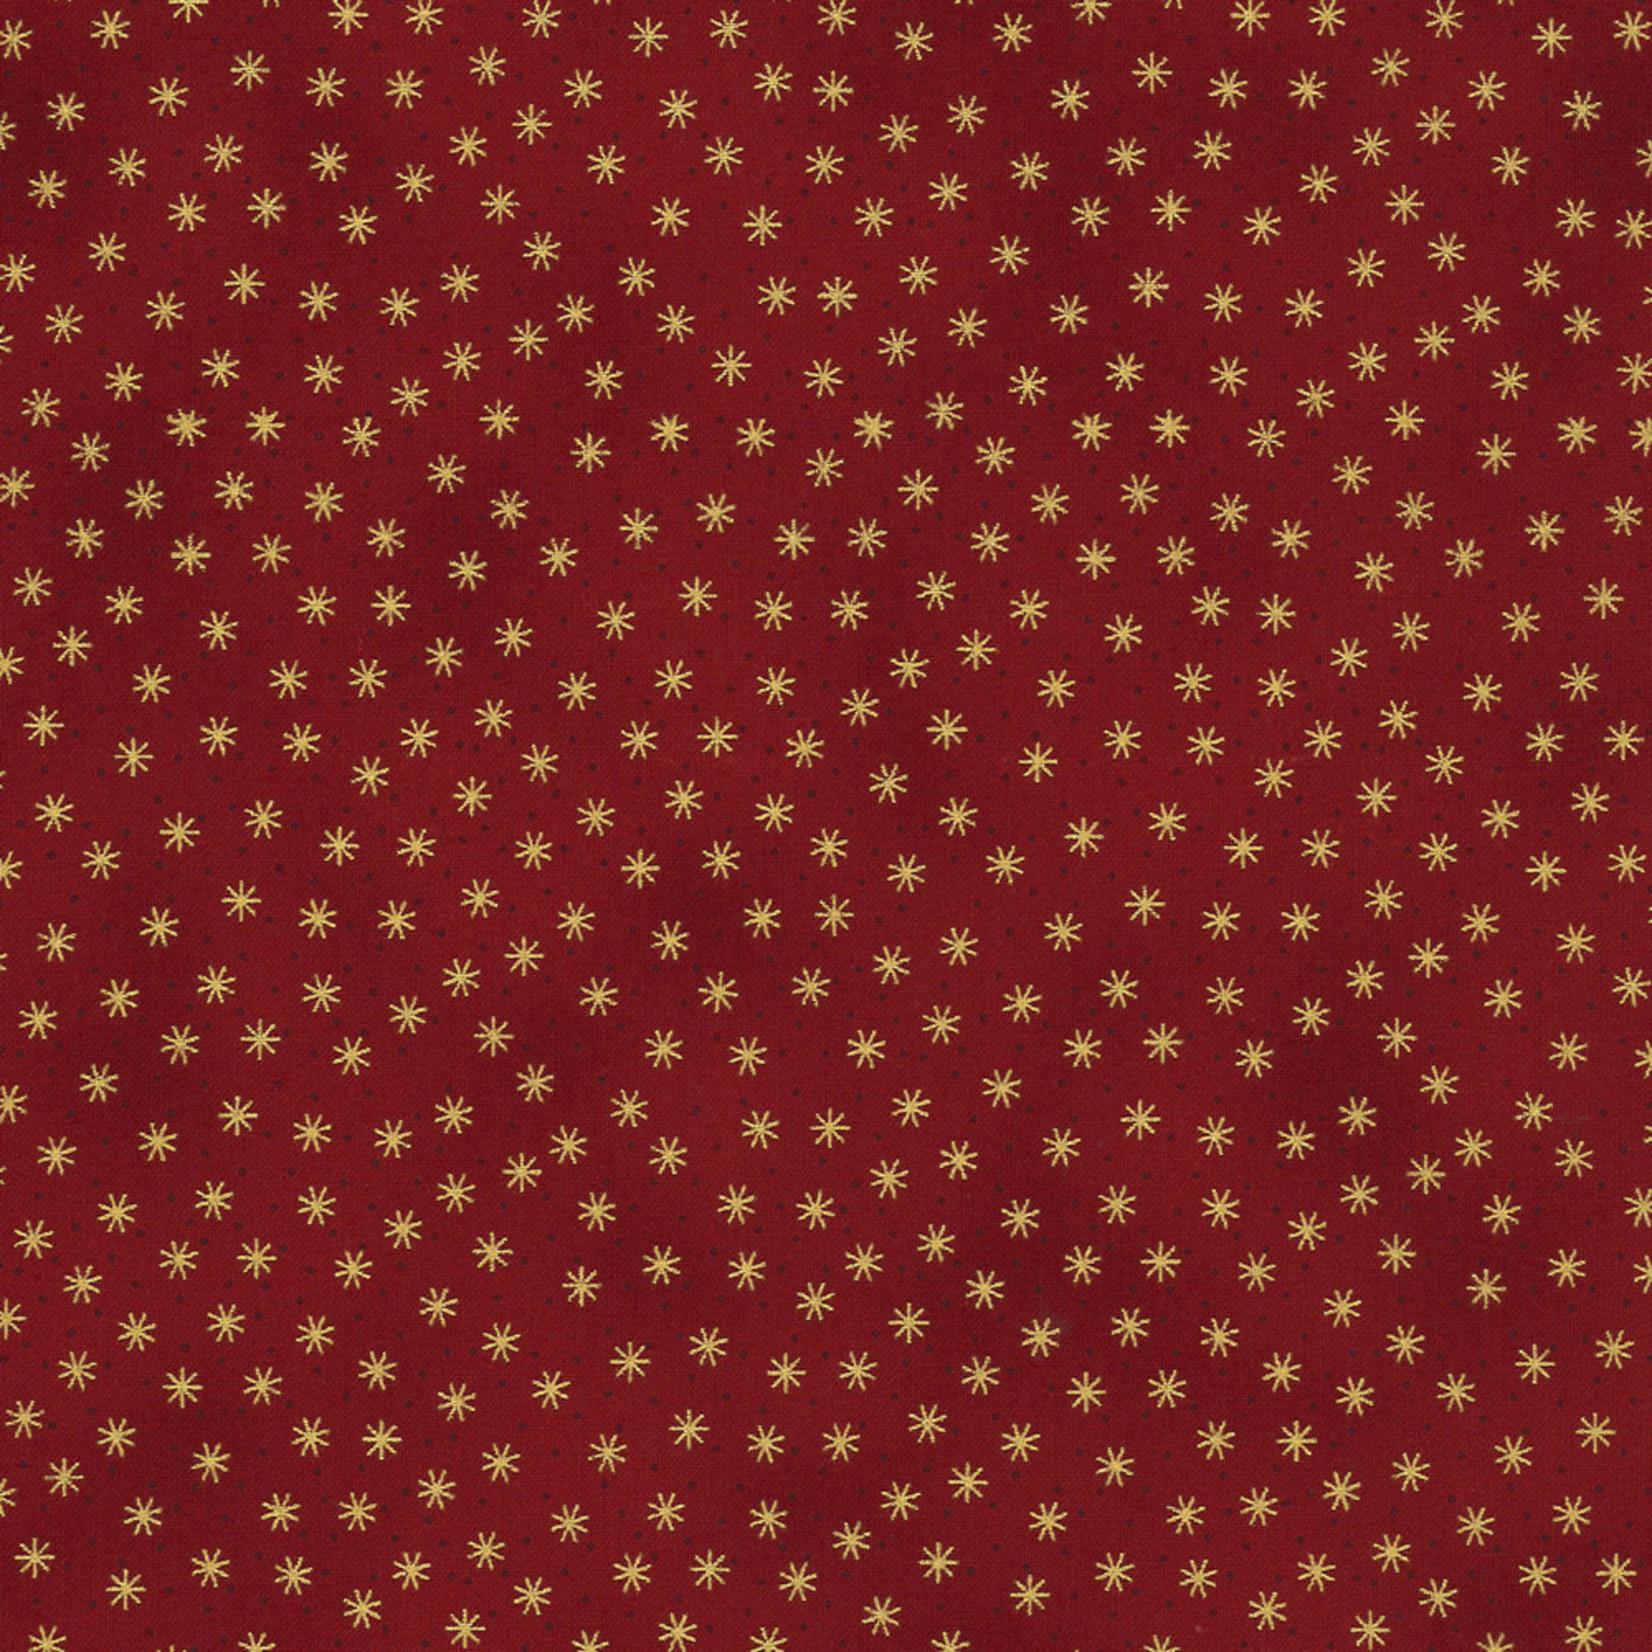 Stoffabrics Christmas Wonders - Stars - Red Gold